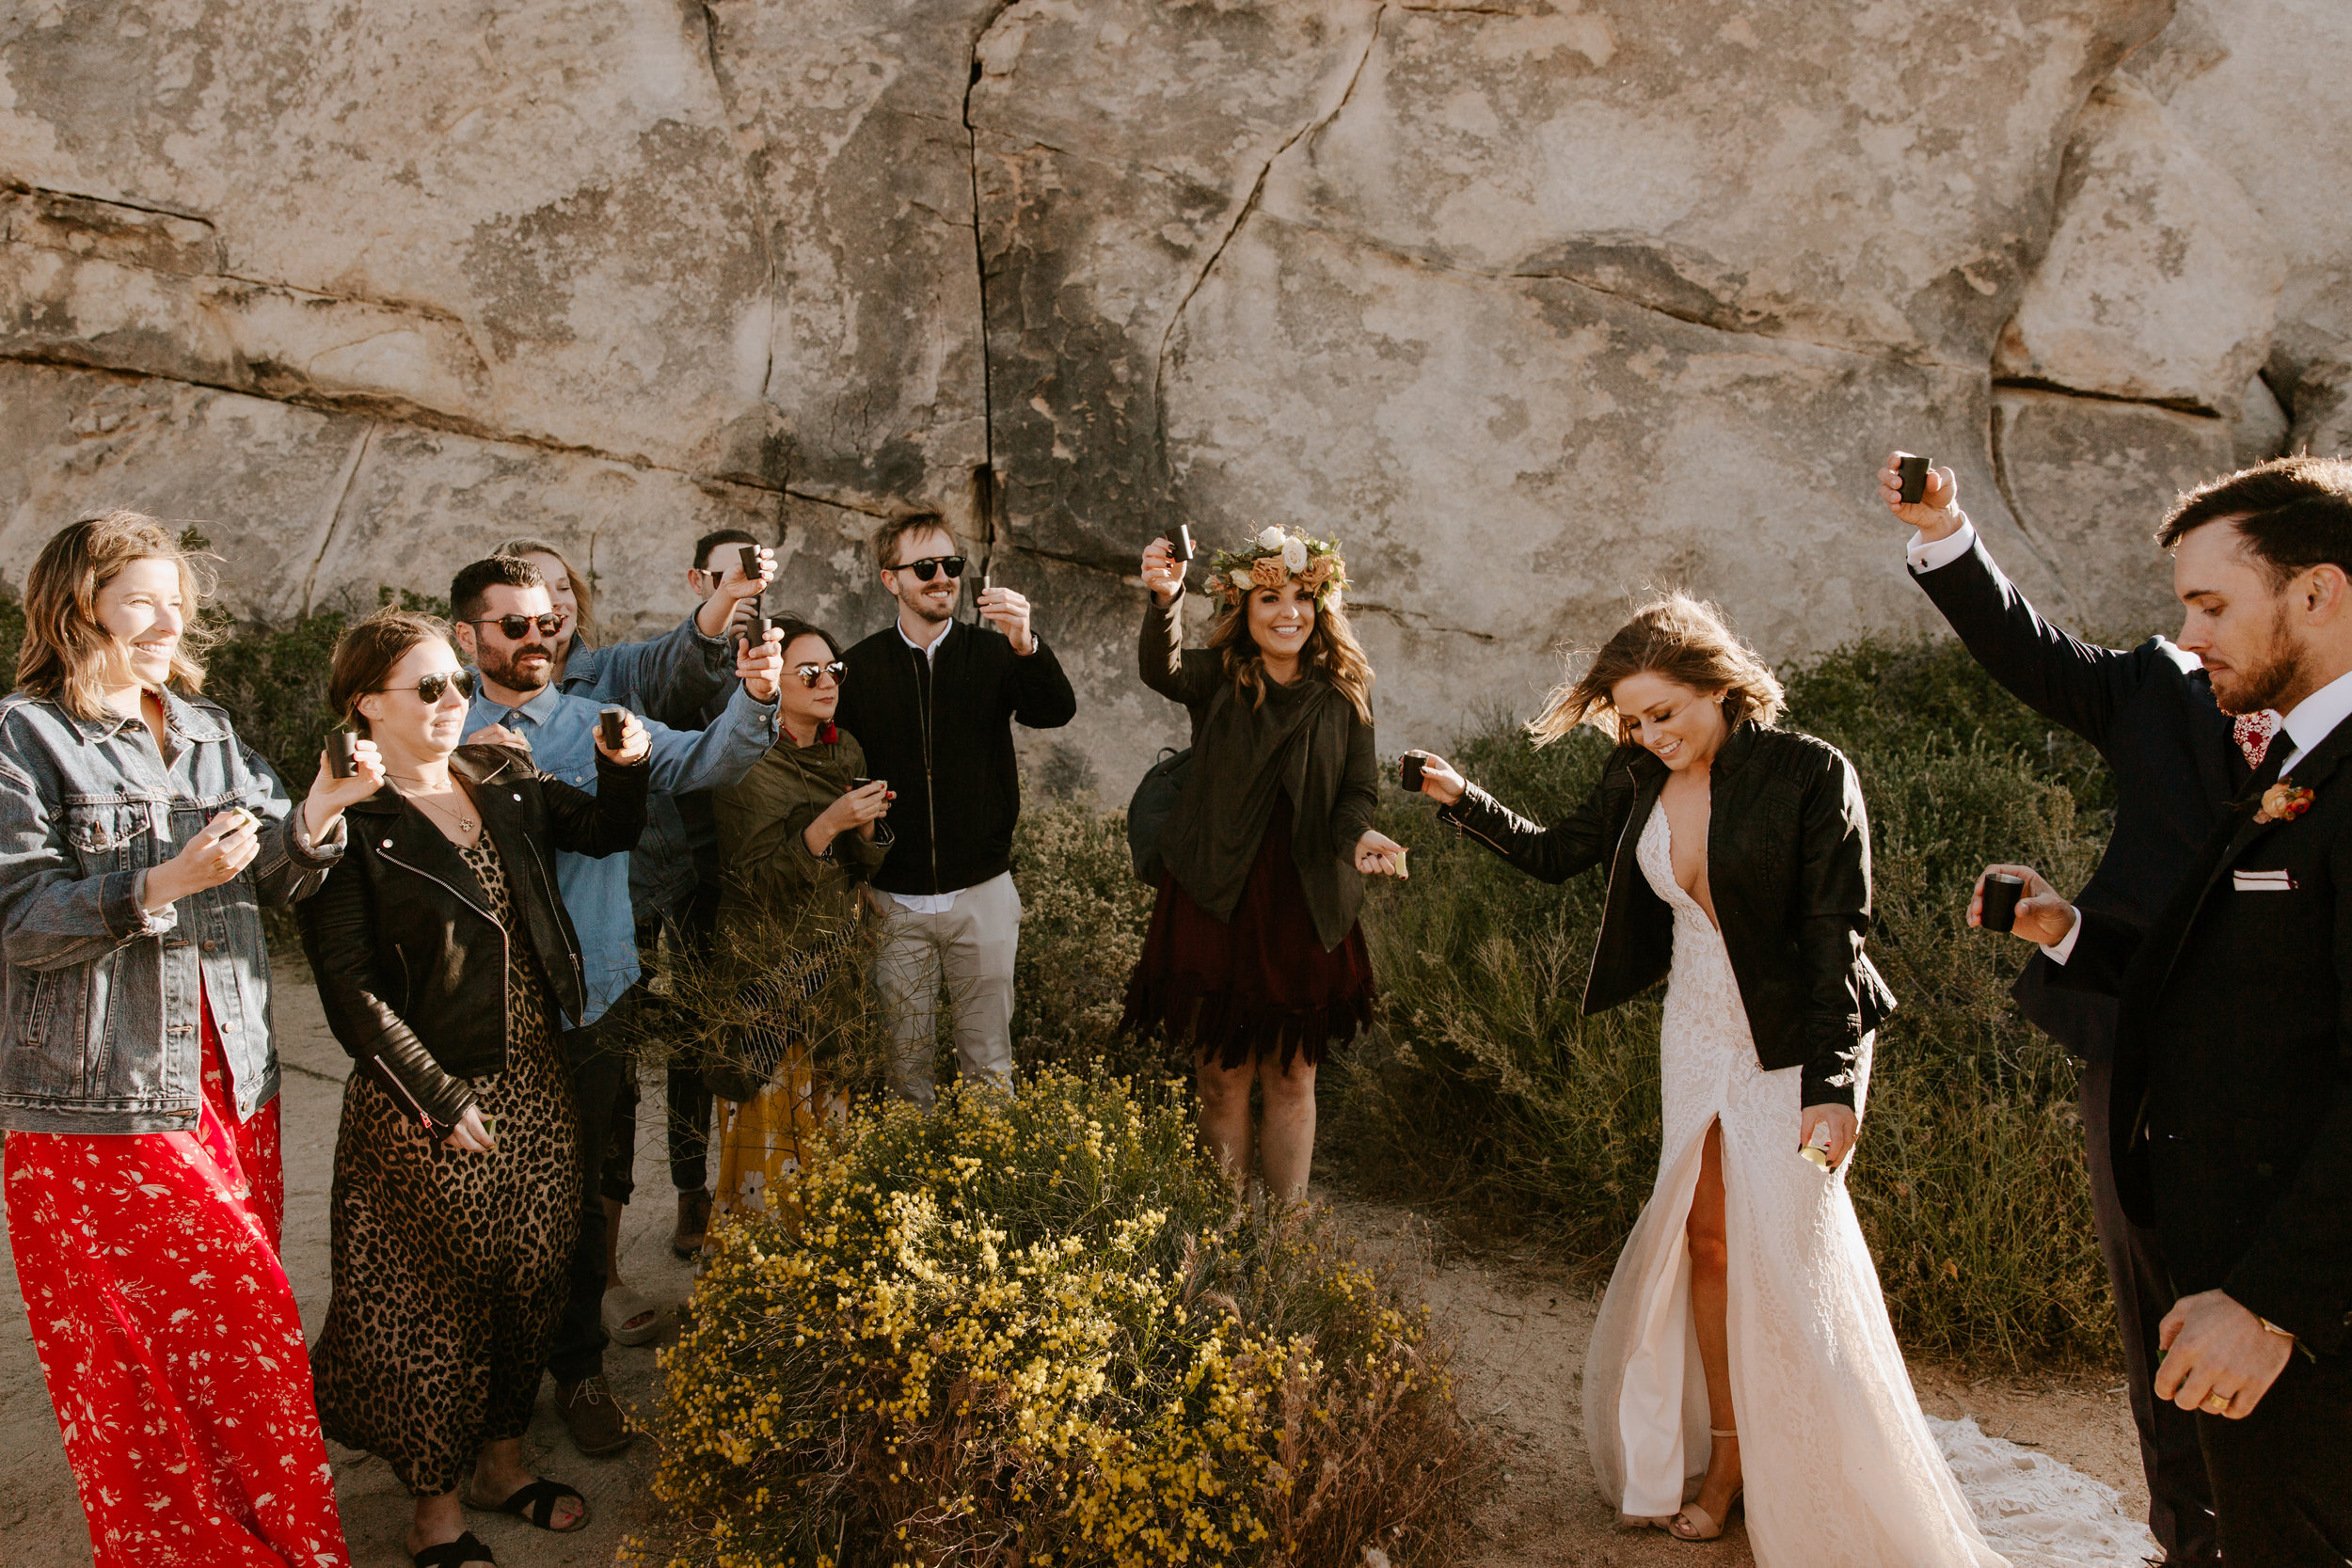 2019-05-26_Callie-Evan_Wedding_Joshua Tree_Paige Nelson_PREVIEWS HR-49.jpg